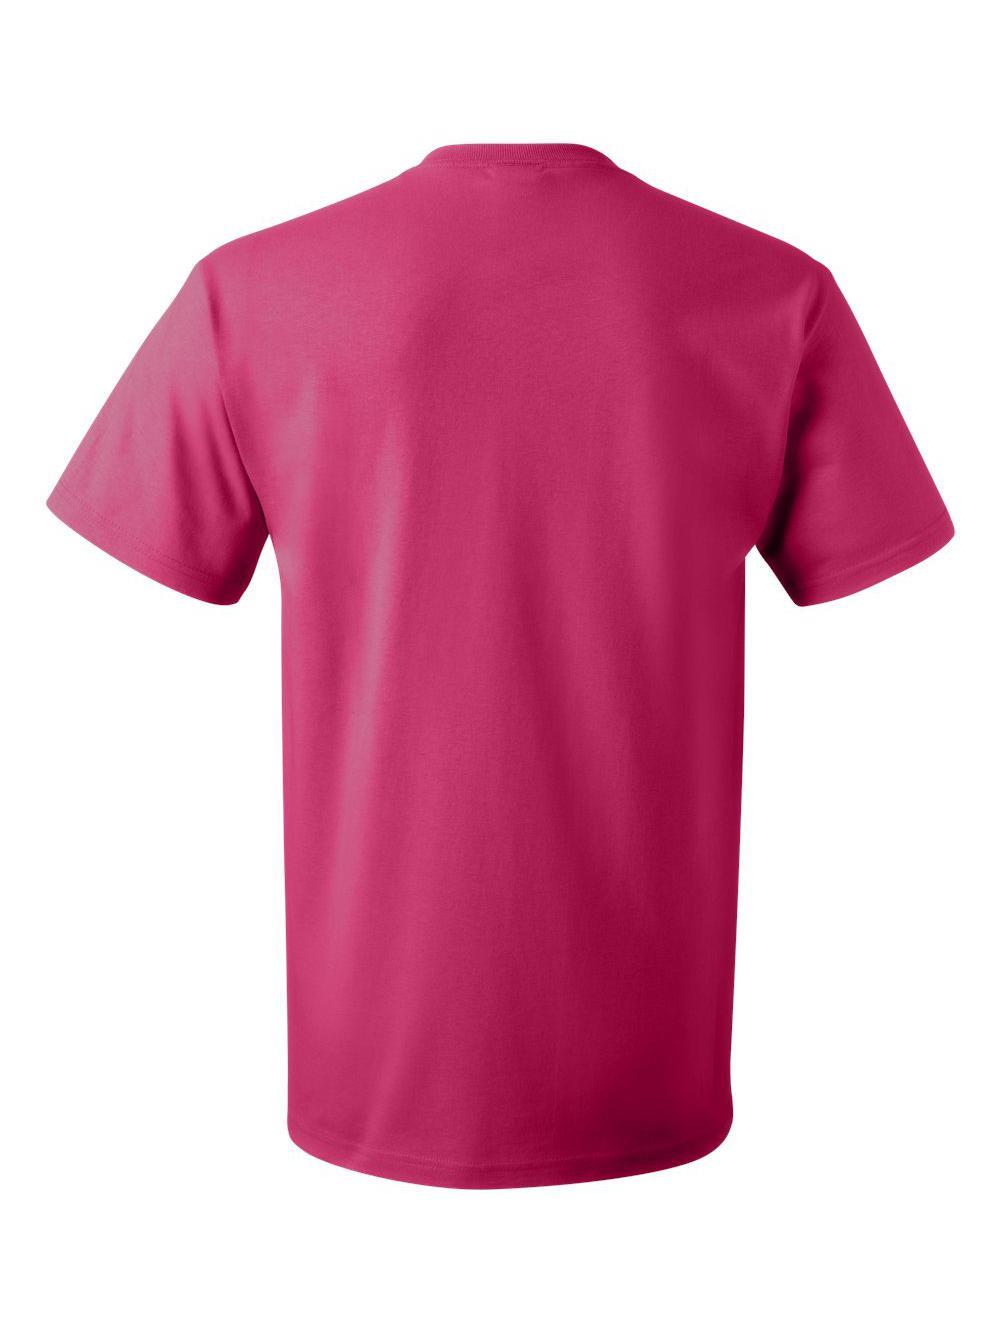 Fruit-of-the-Loom-HD-Cotton-Short-Sleeve-T-Shirt-3930R thumbnail 43